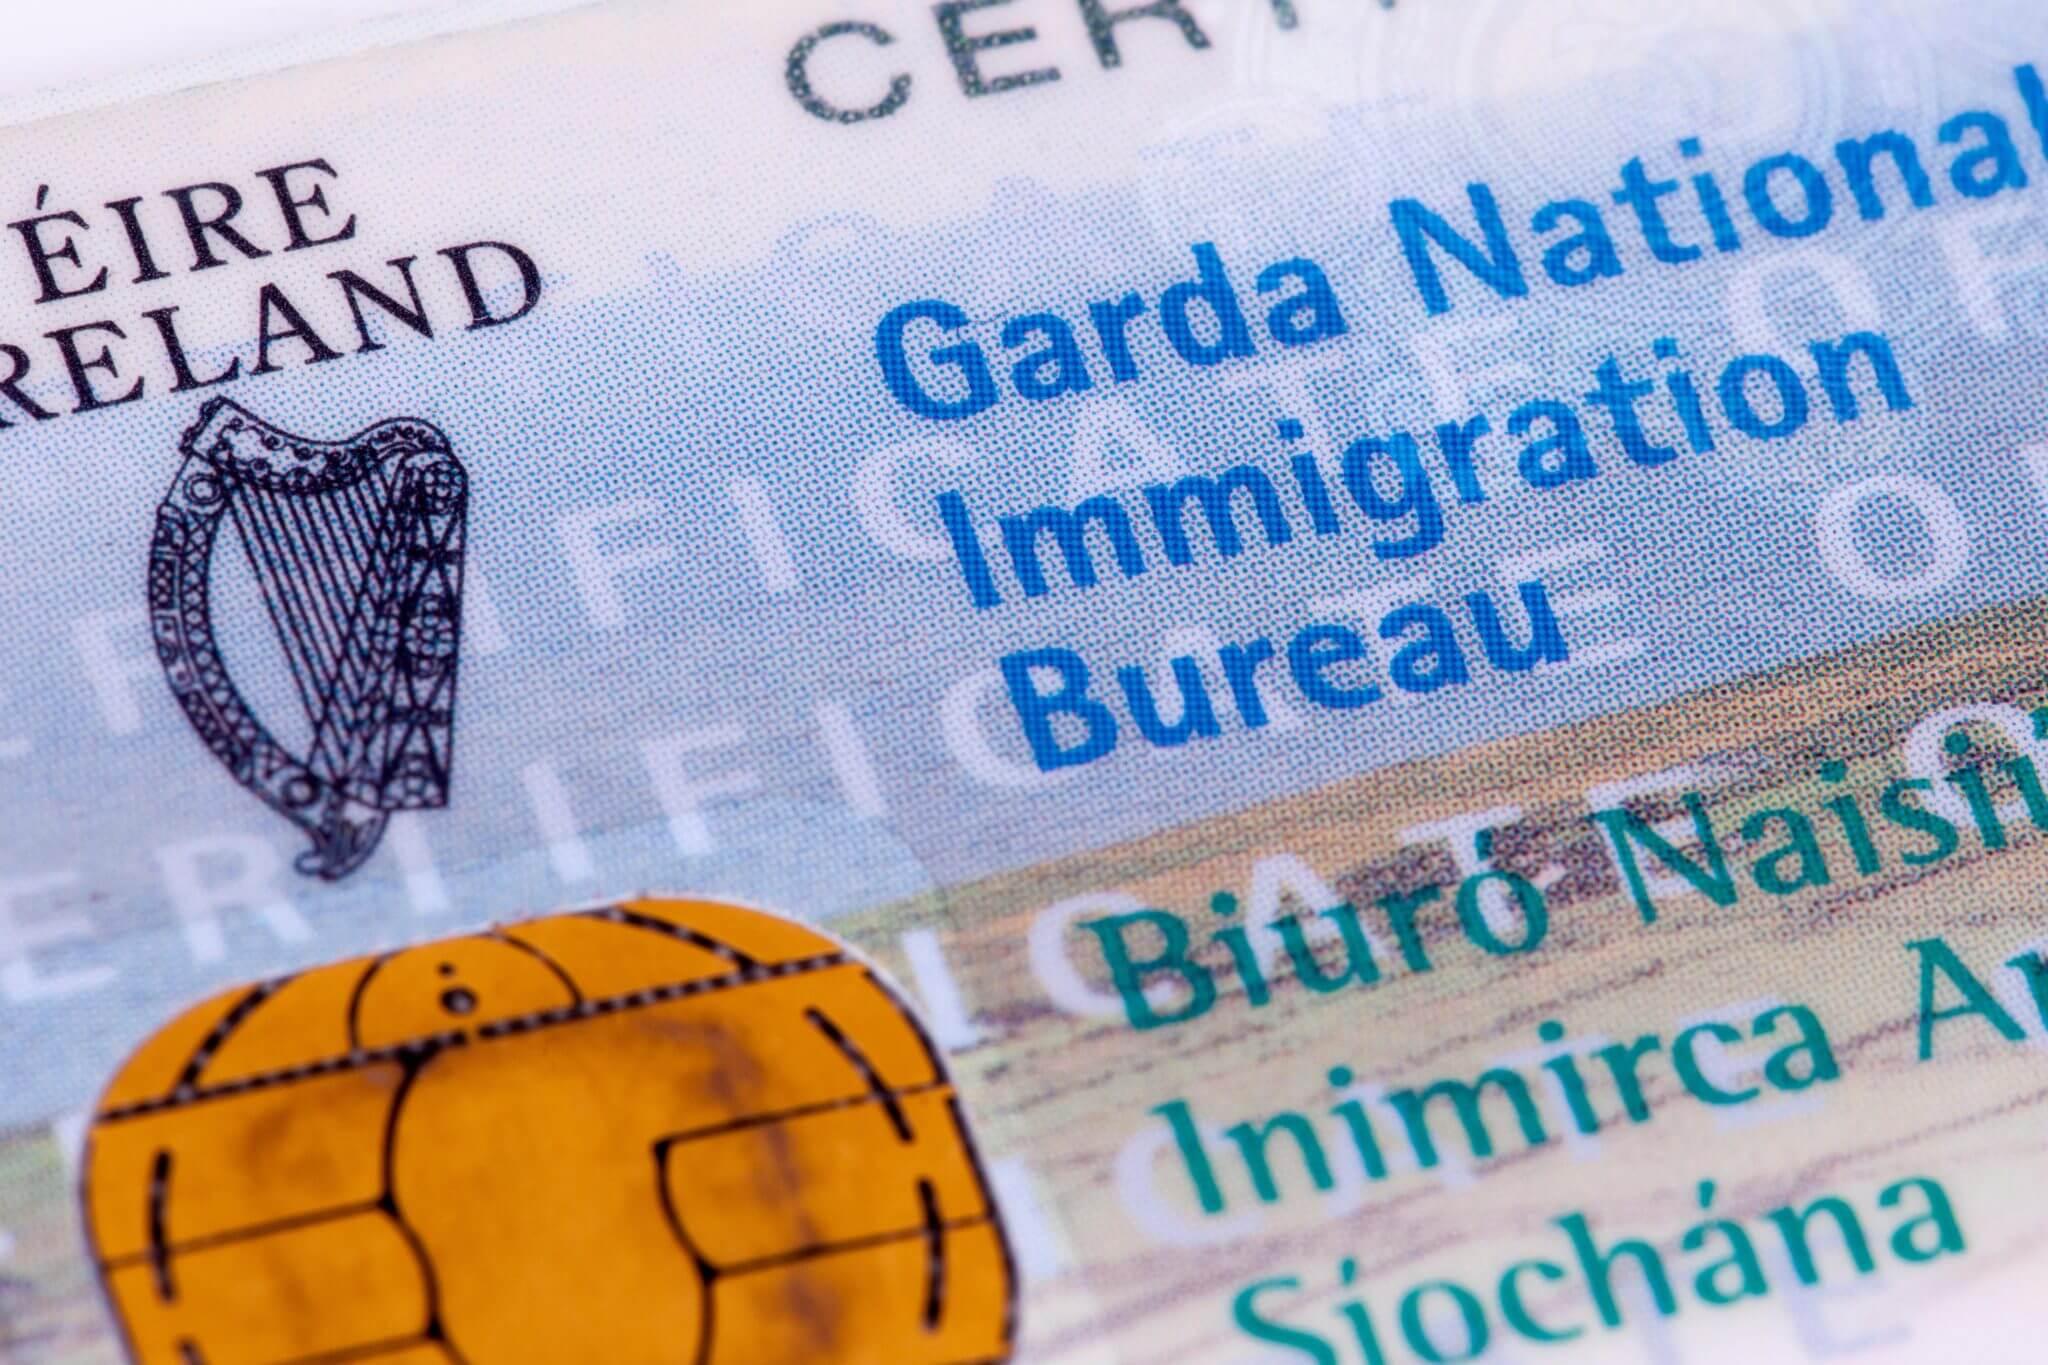 Studant Visa Ireland Imigration